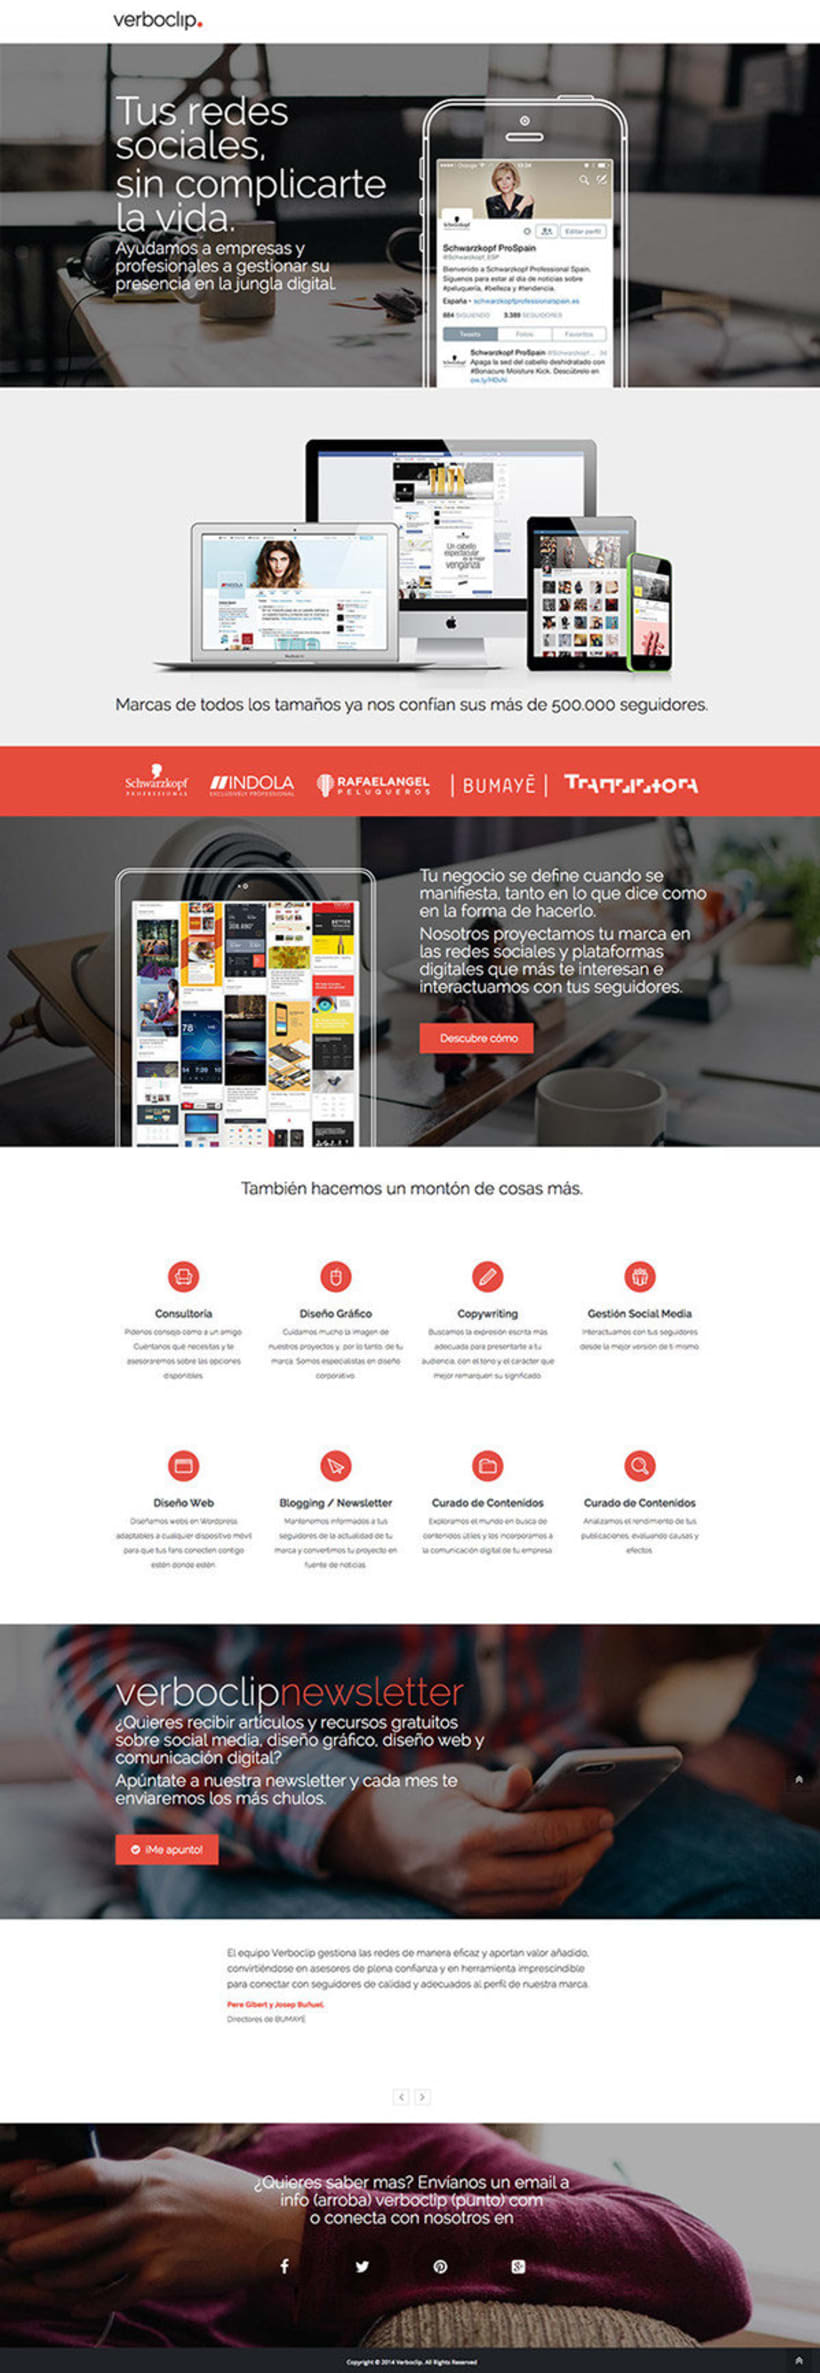 Verboclip, branding y website. 1